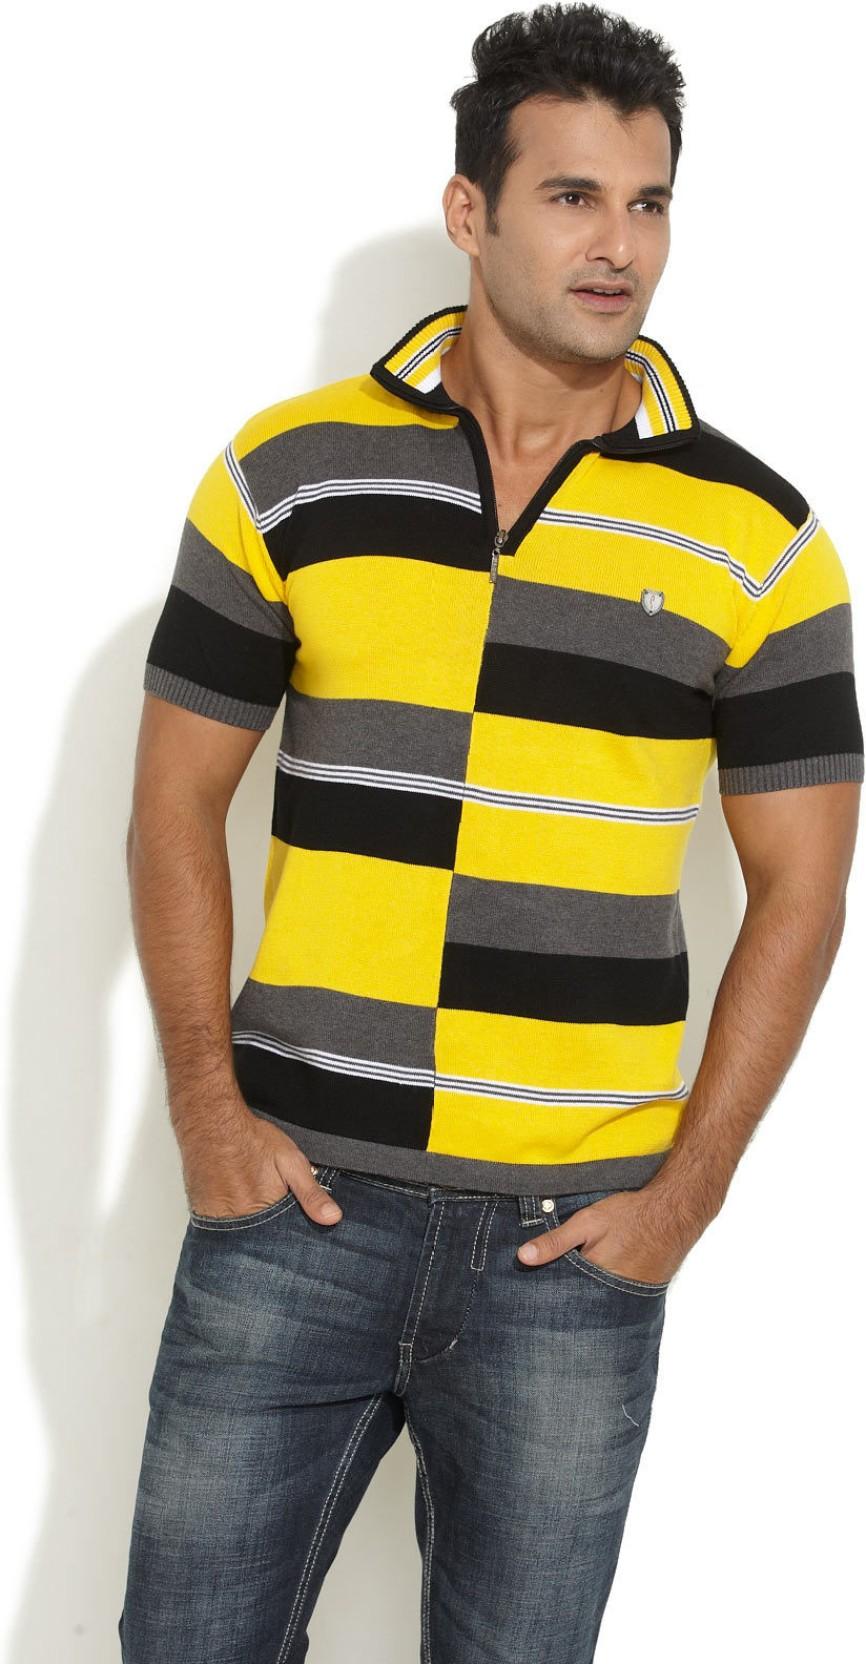 460bb1ca9f Stride T Shirts Online India – DACC